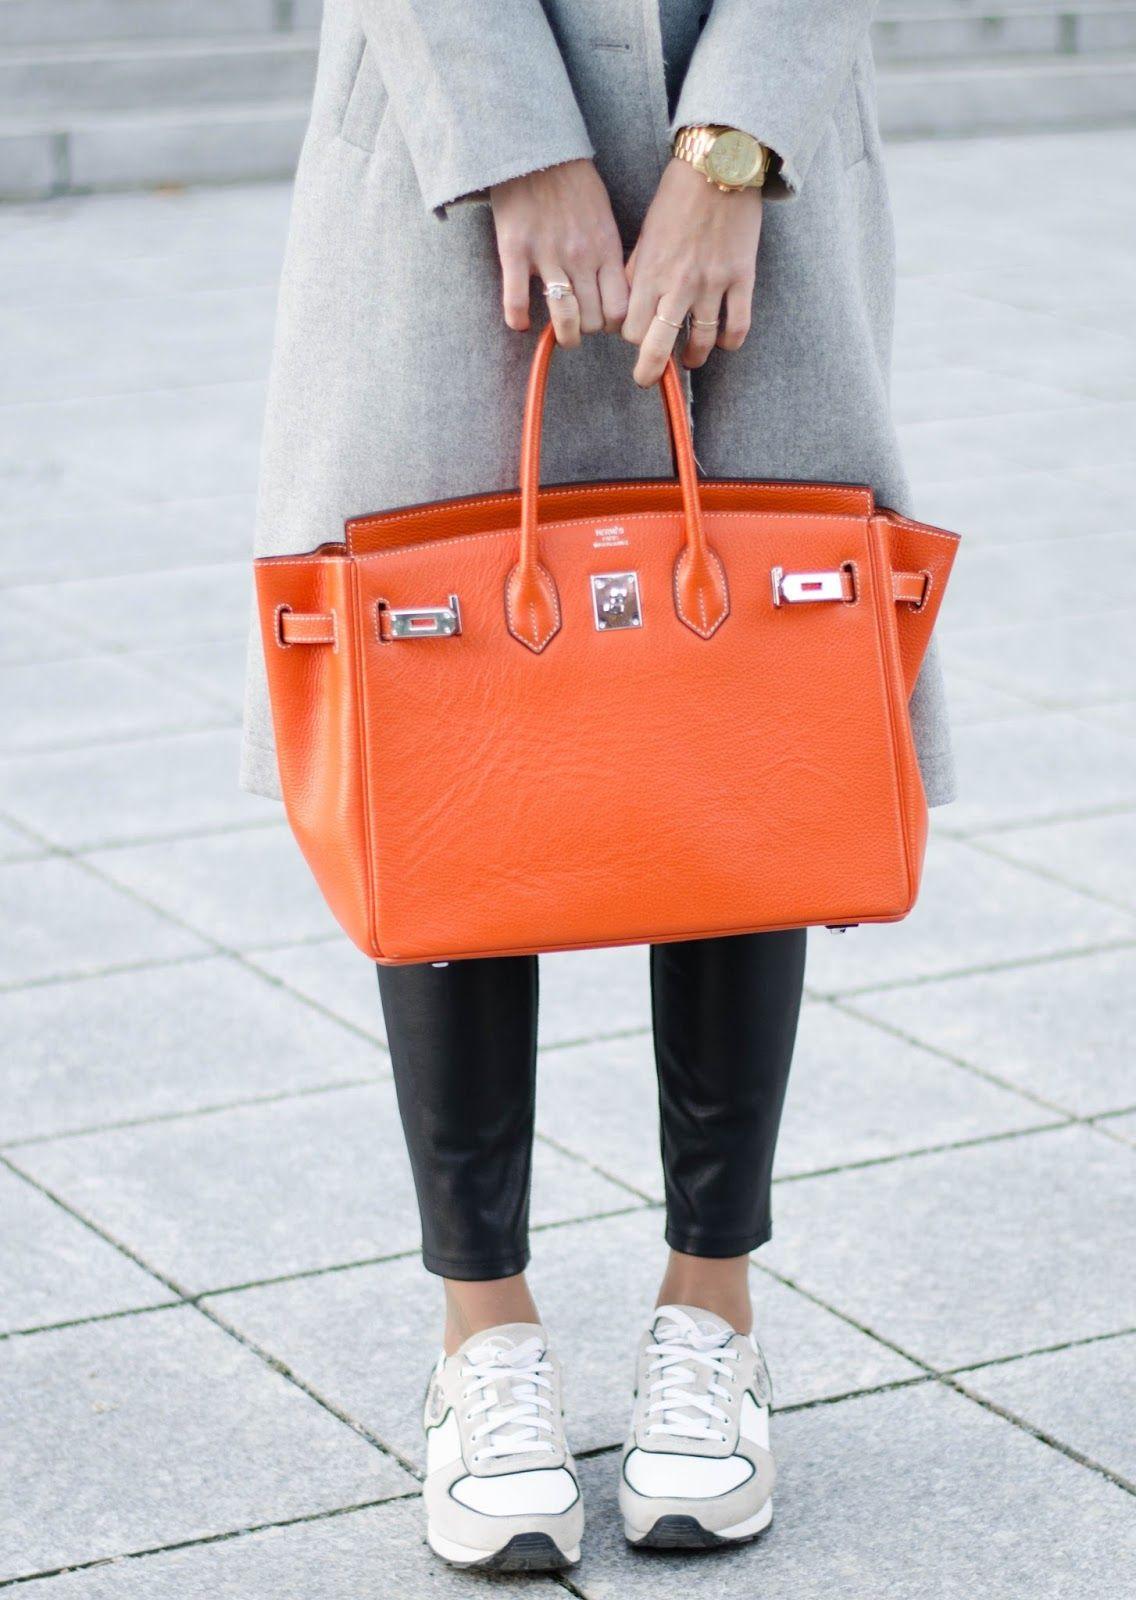 8a268c0616a3 kristjaana mere orange hermes birkin bag leather pants white sneakers  winter style